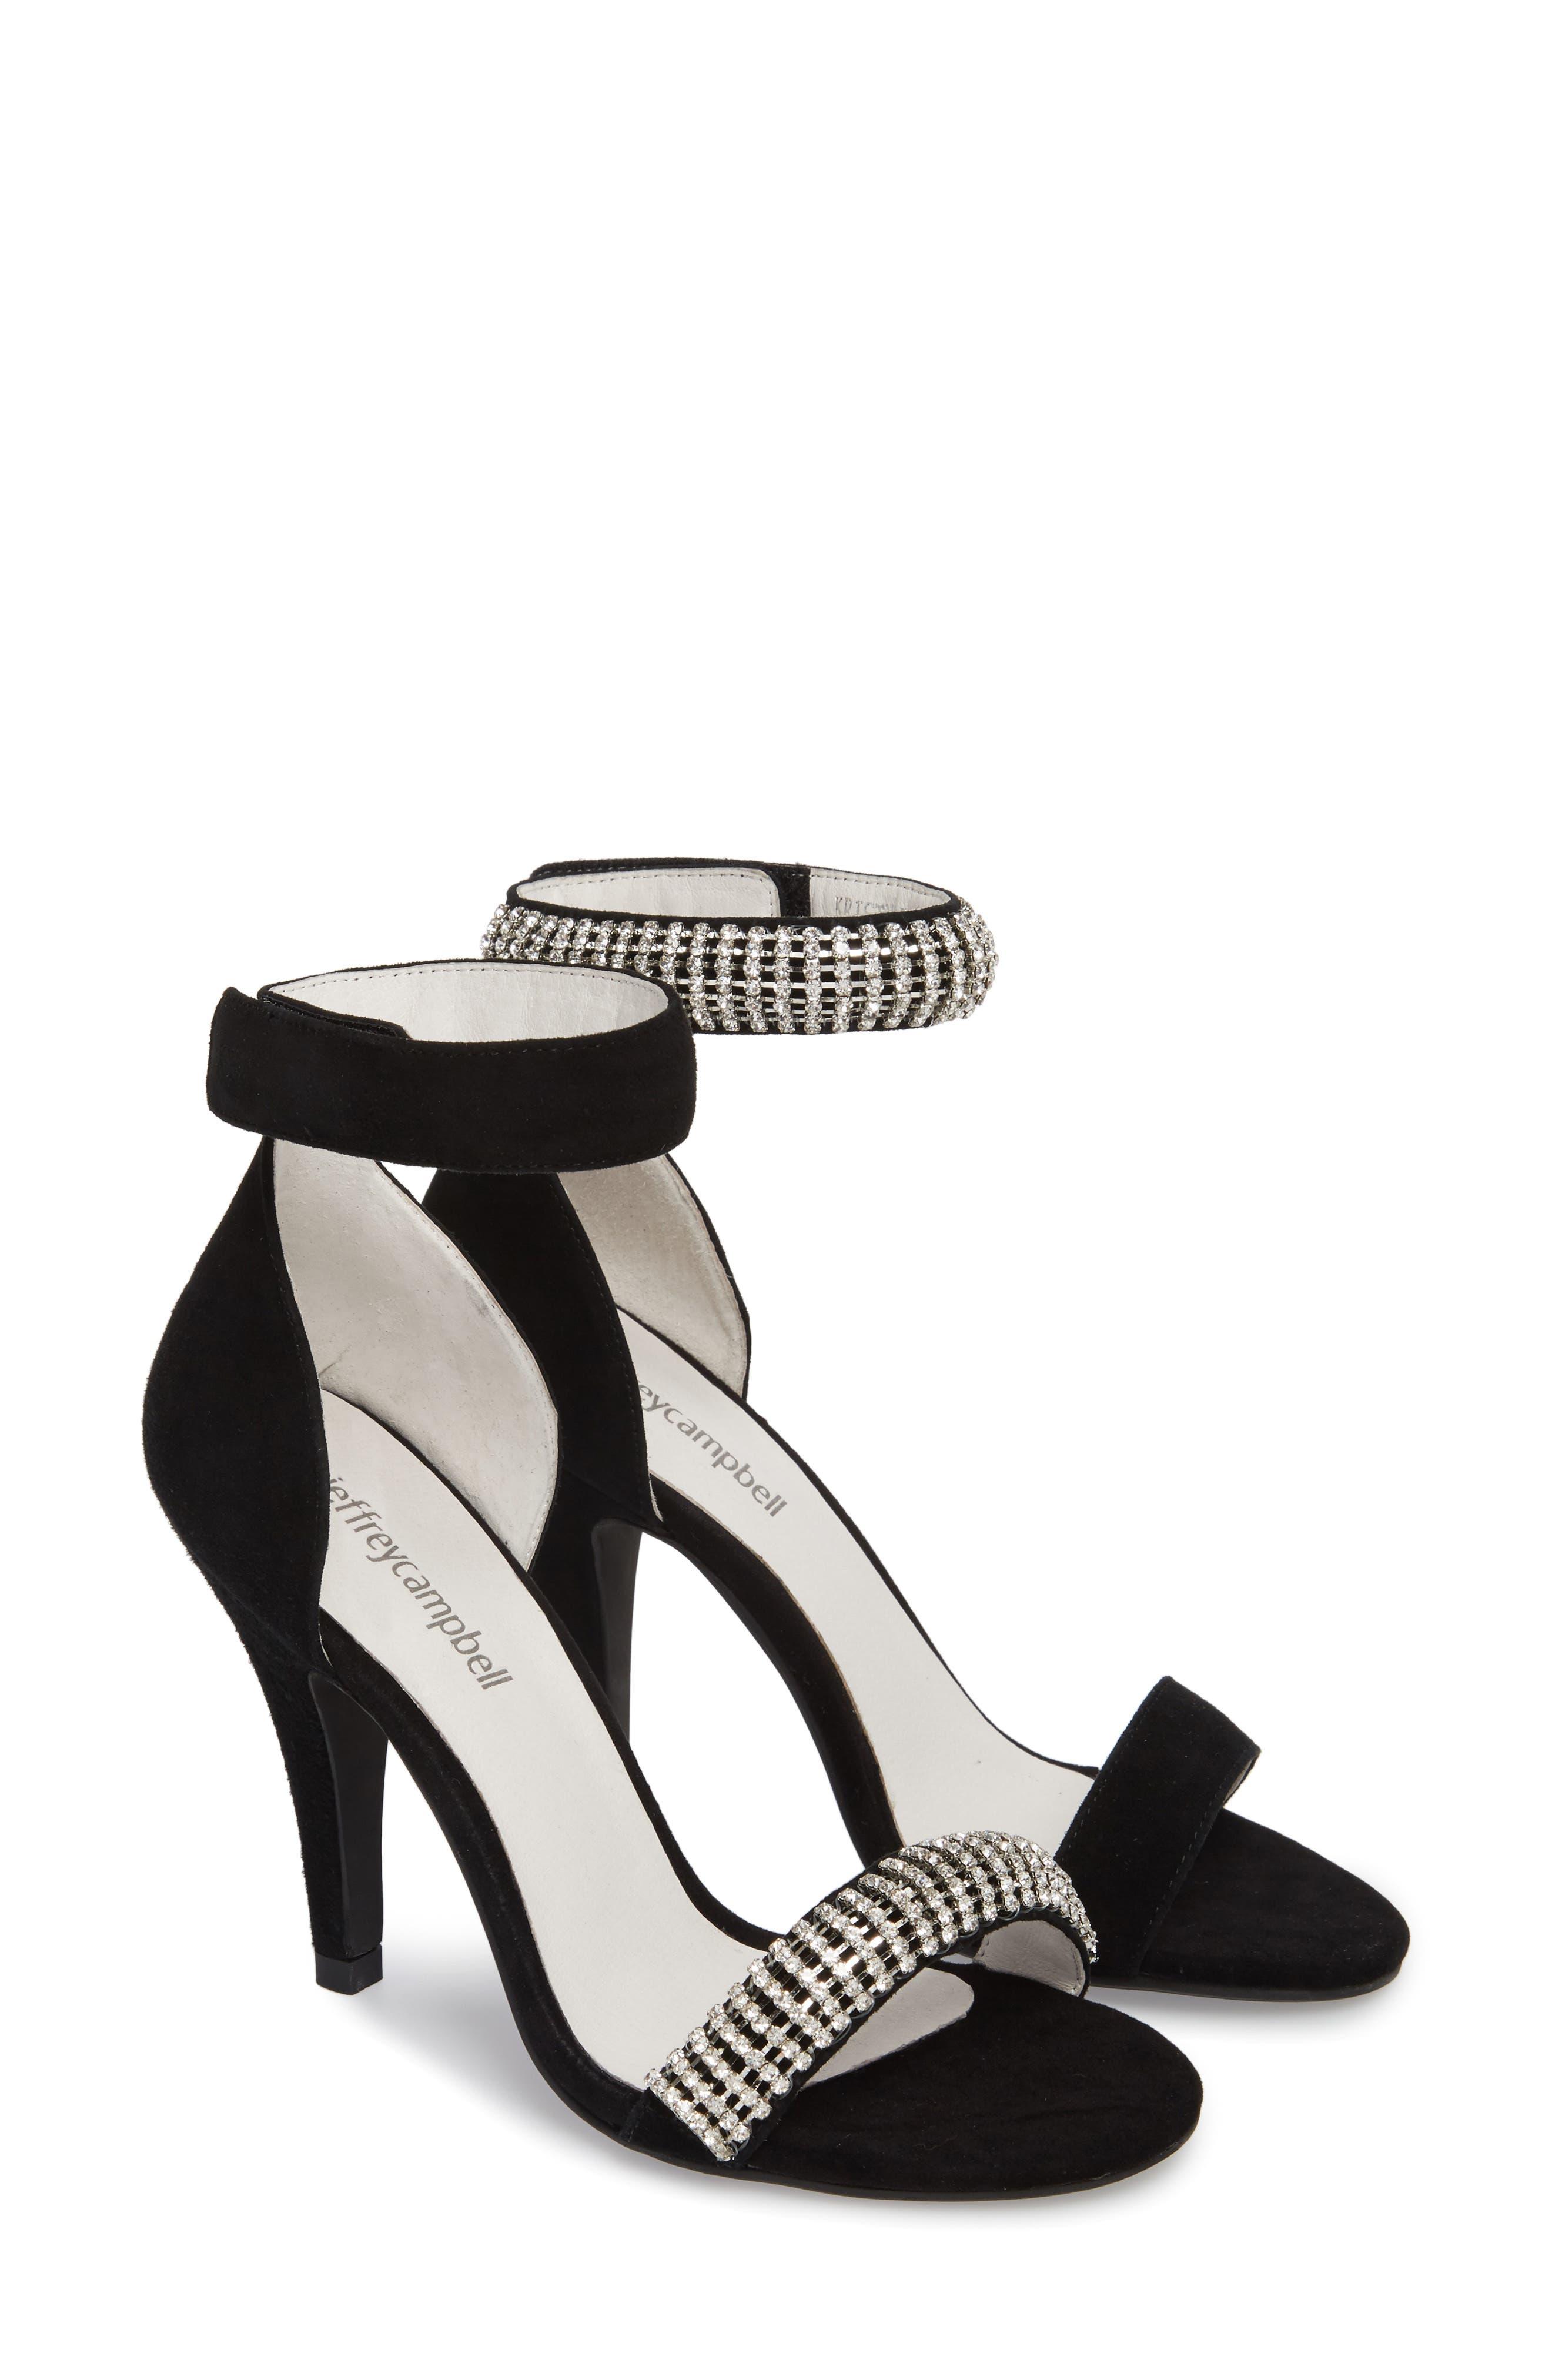 Pumps & High Heels for Women On Sale, Black, satin, 2017, 3.5 4 4.5 5 Prada